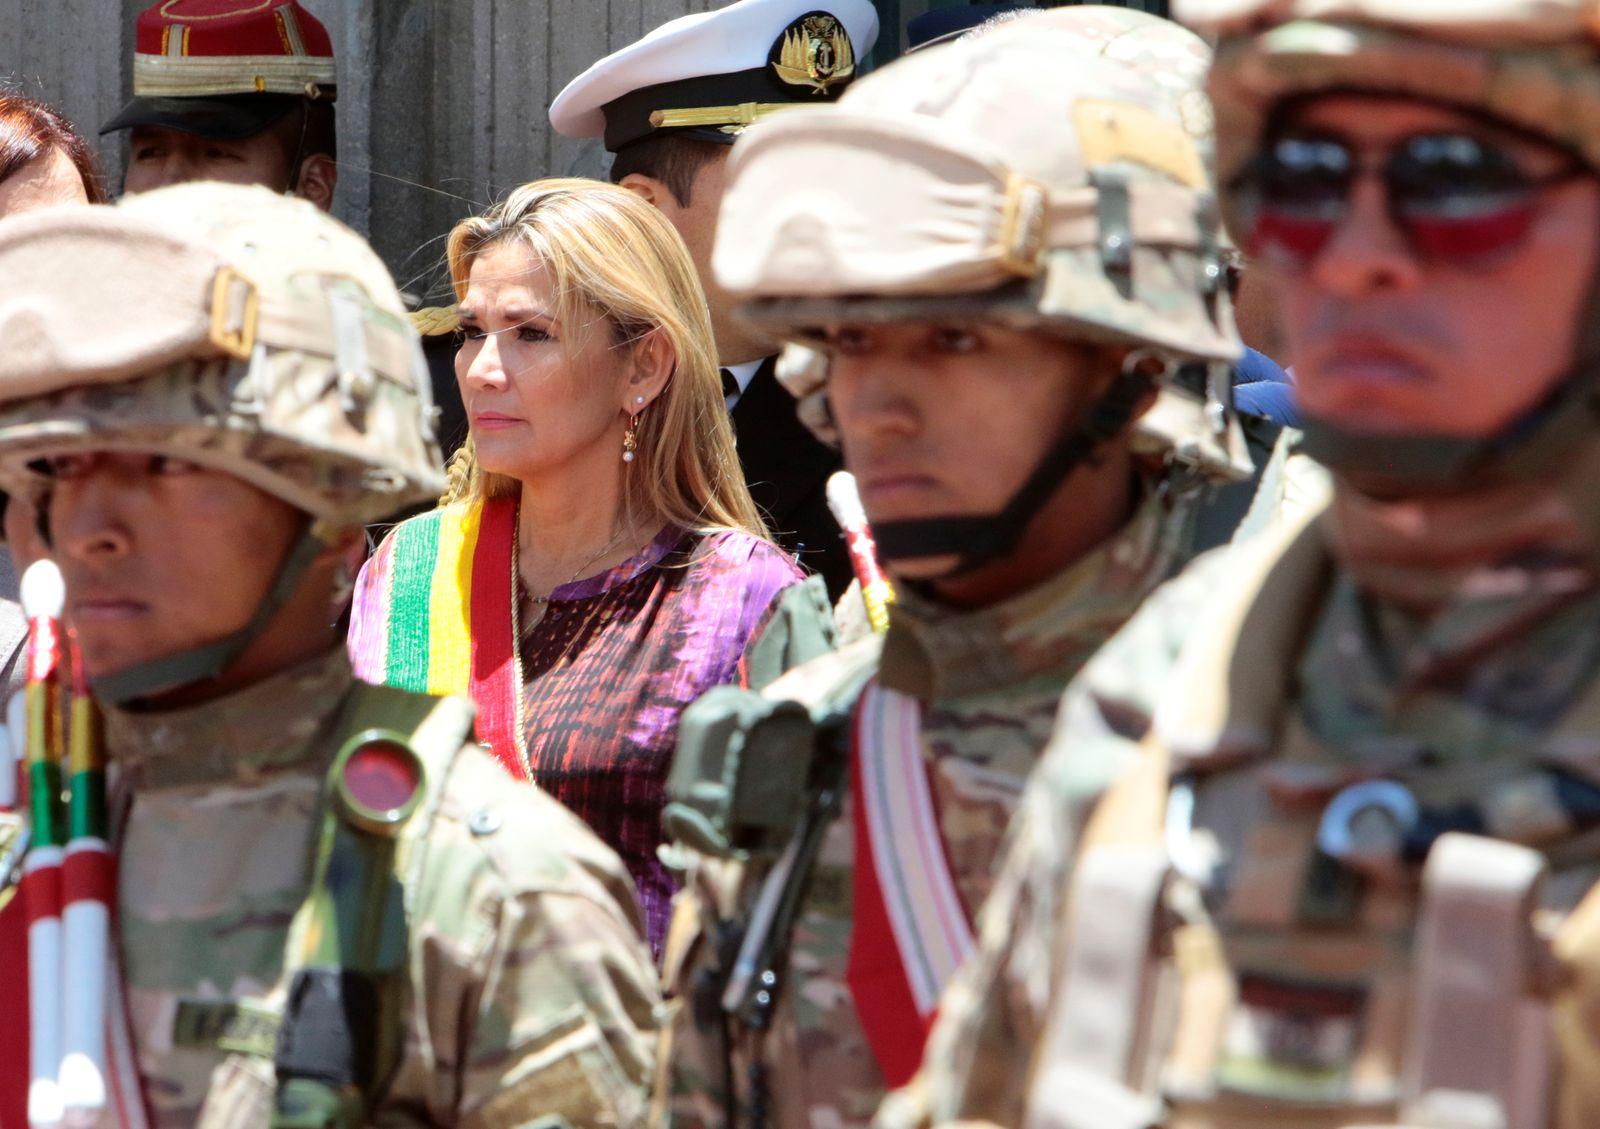 Bolivia's interim president Jeanine Anez attends a ceremony in La Paz